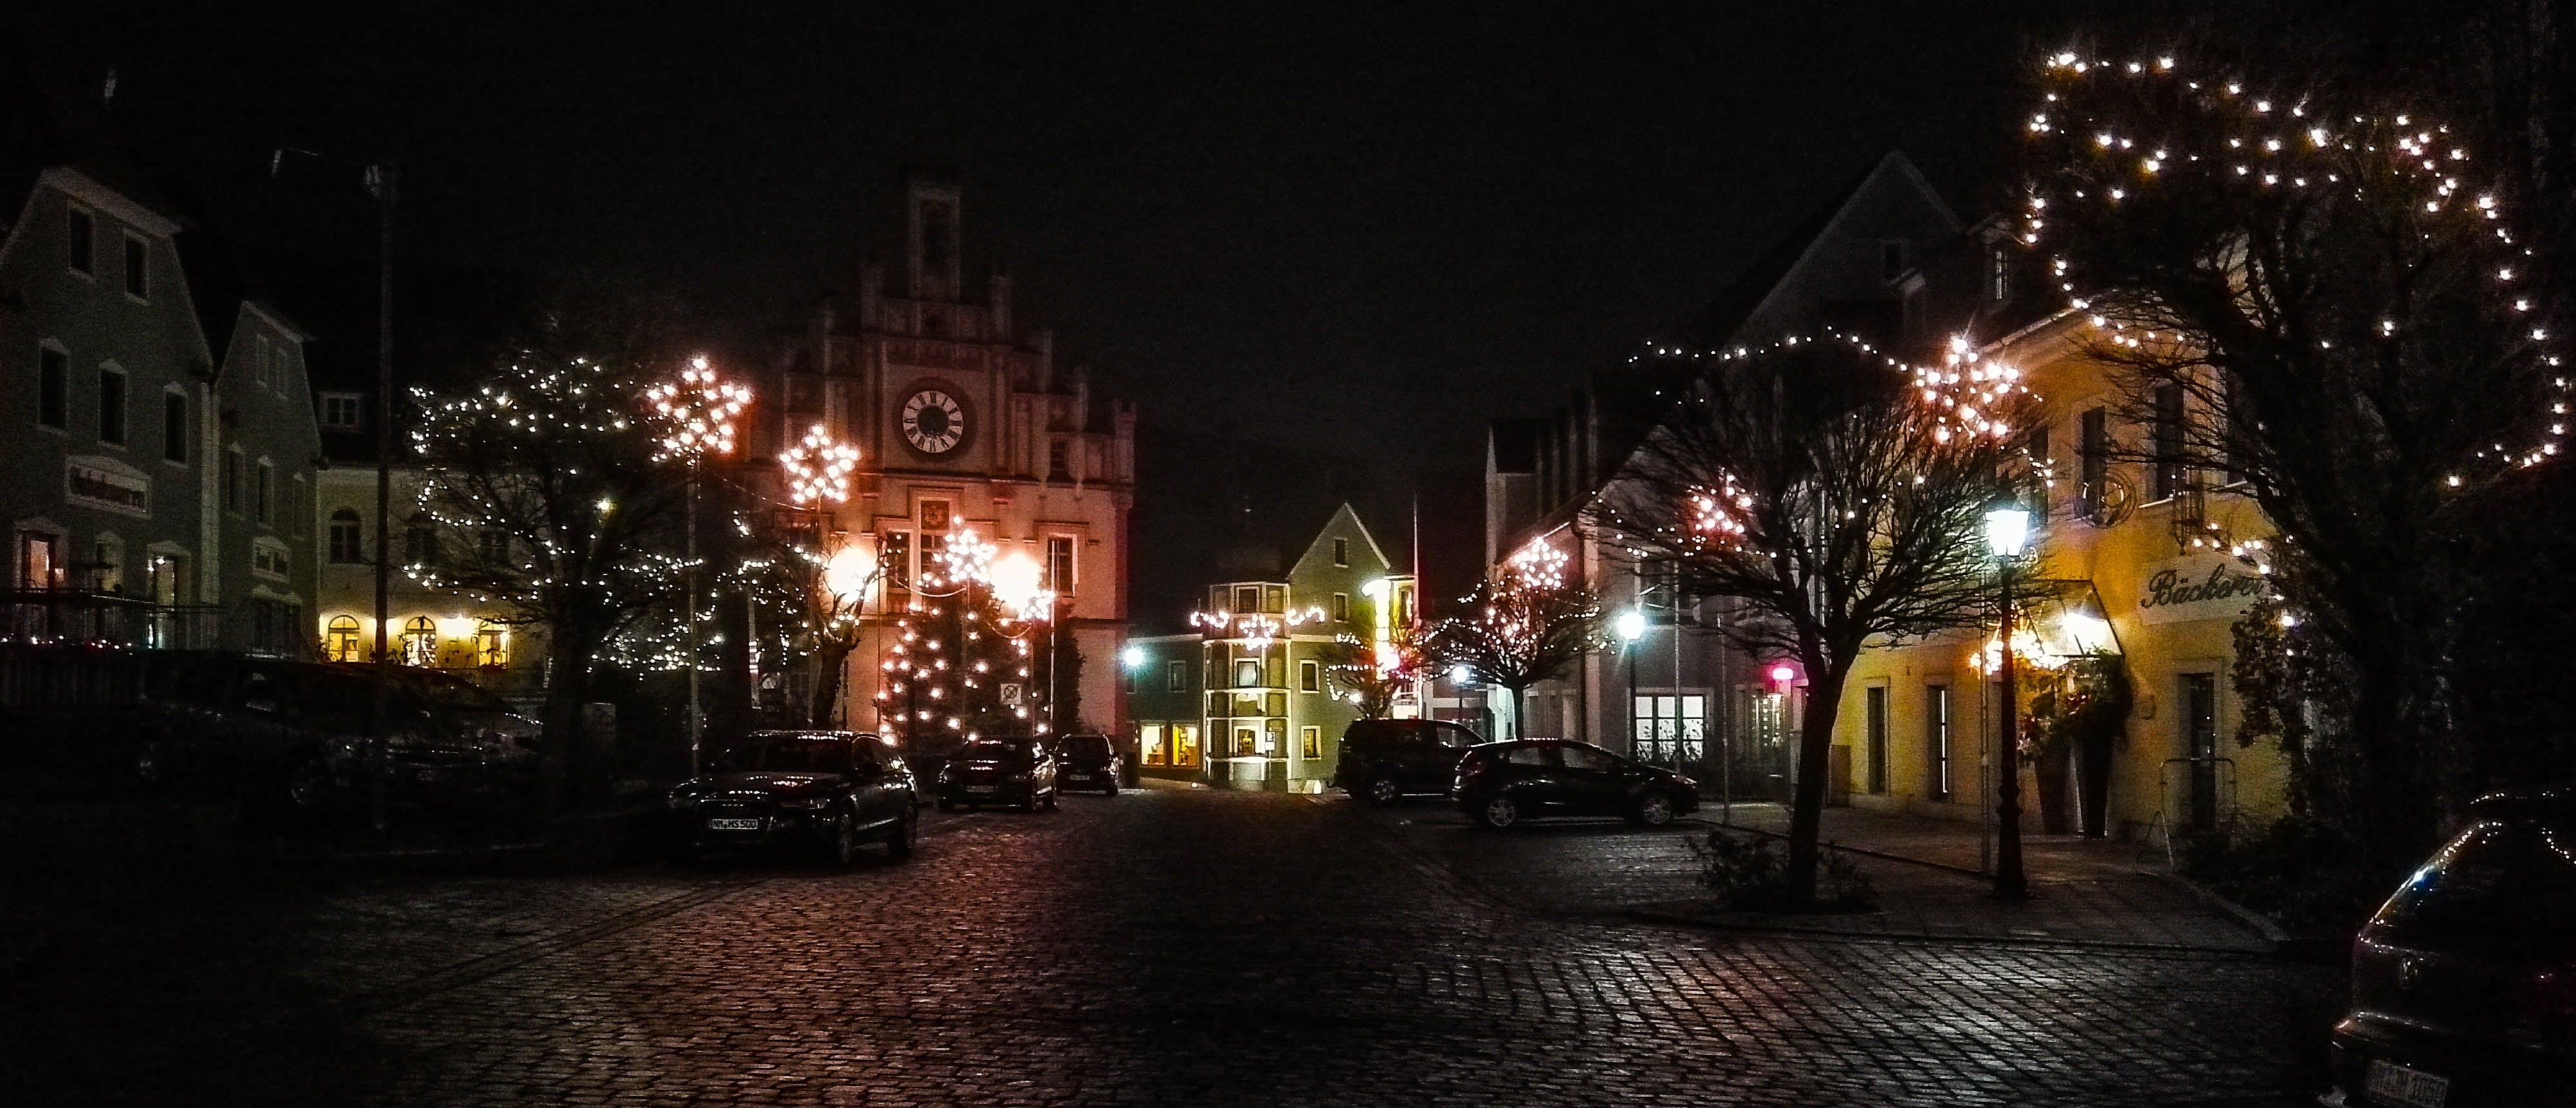 Free stock photo of christmas, lights, night, street